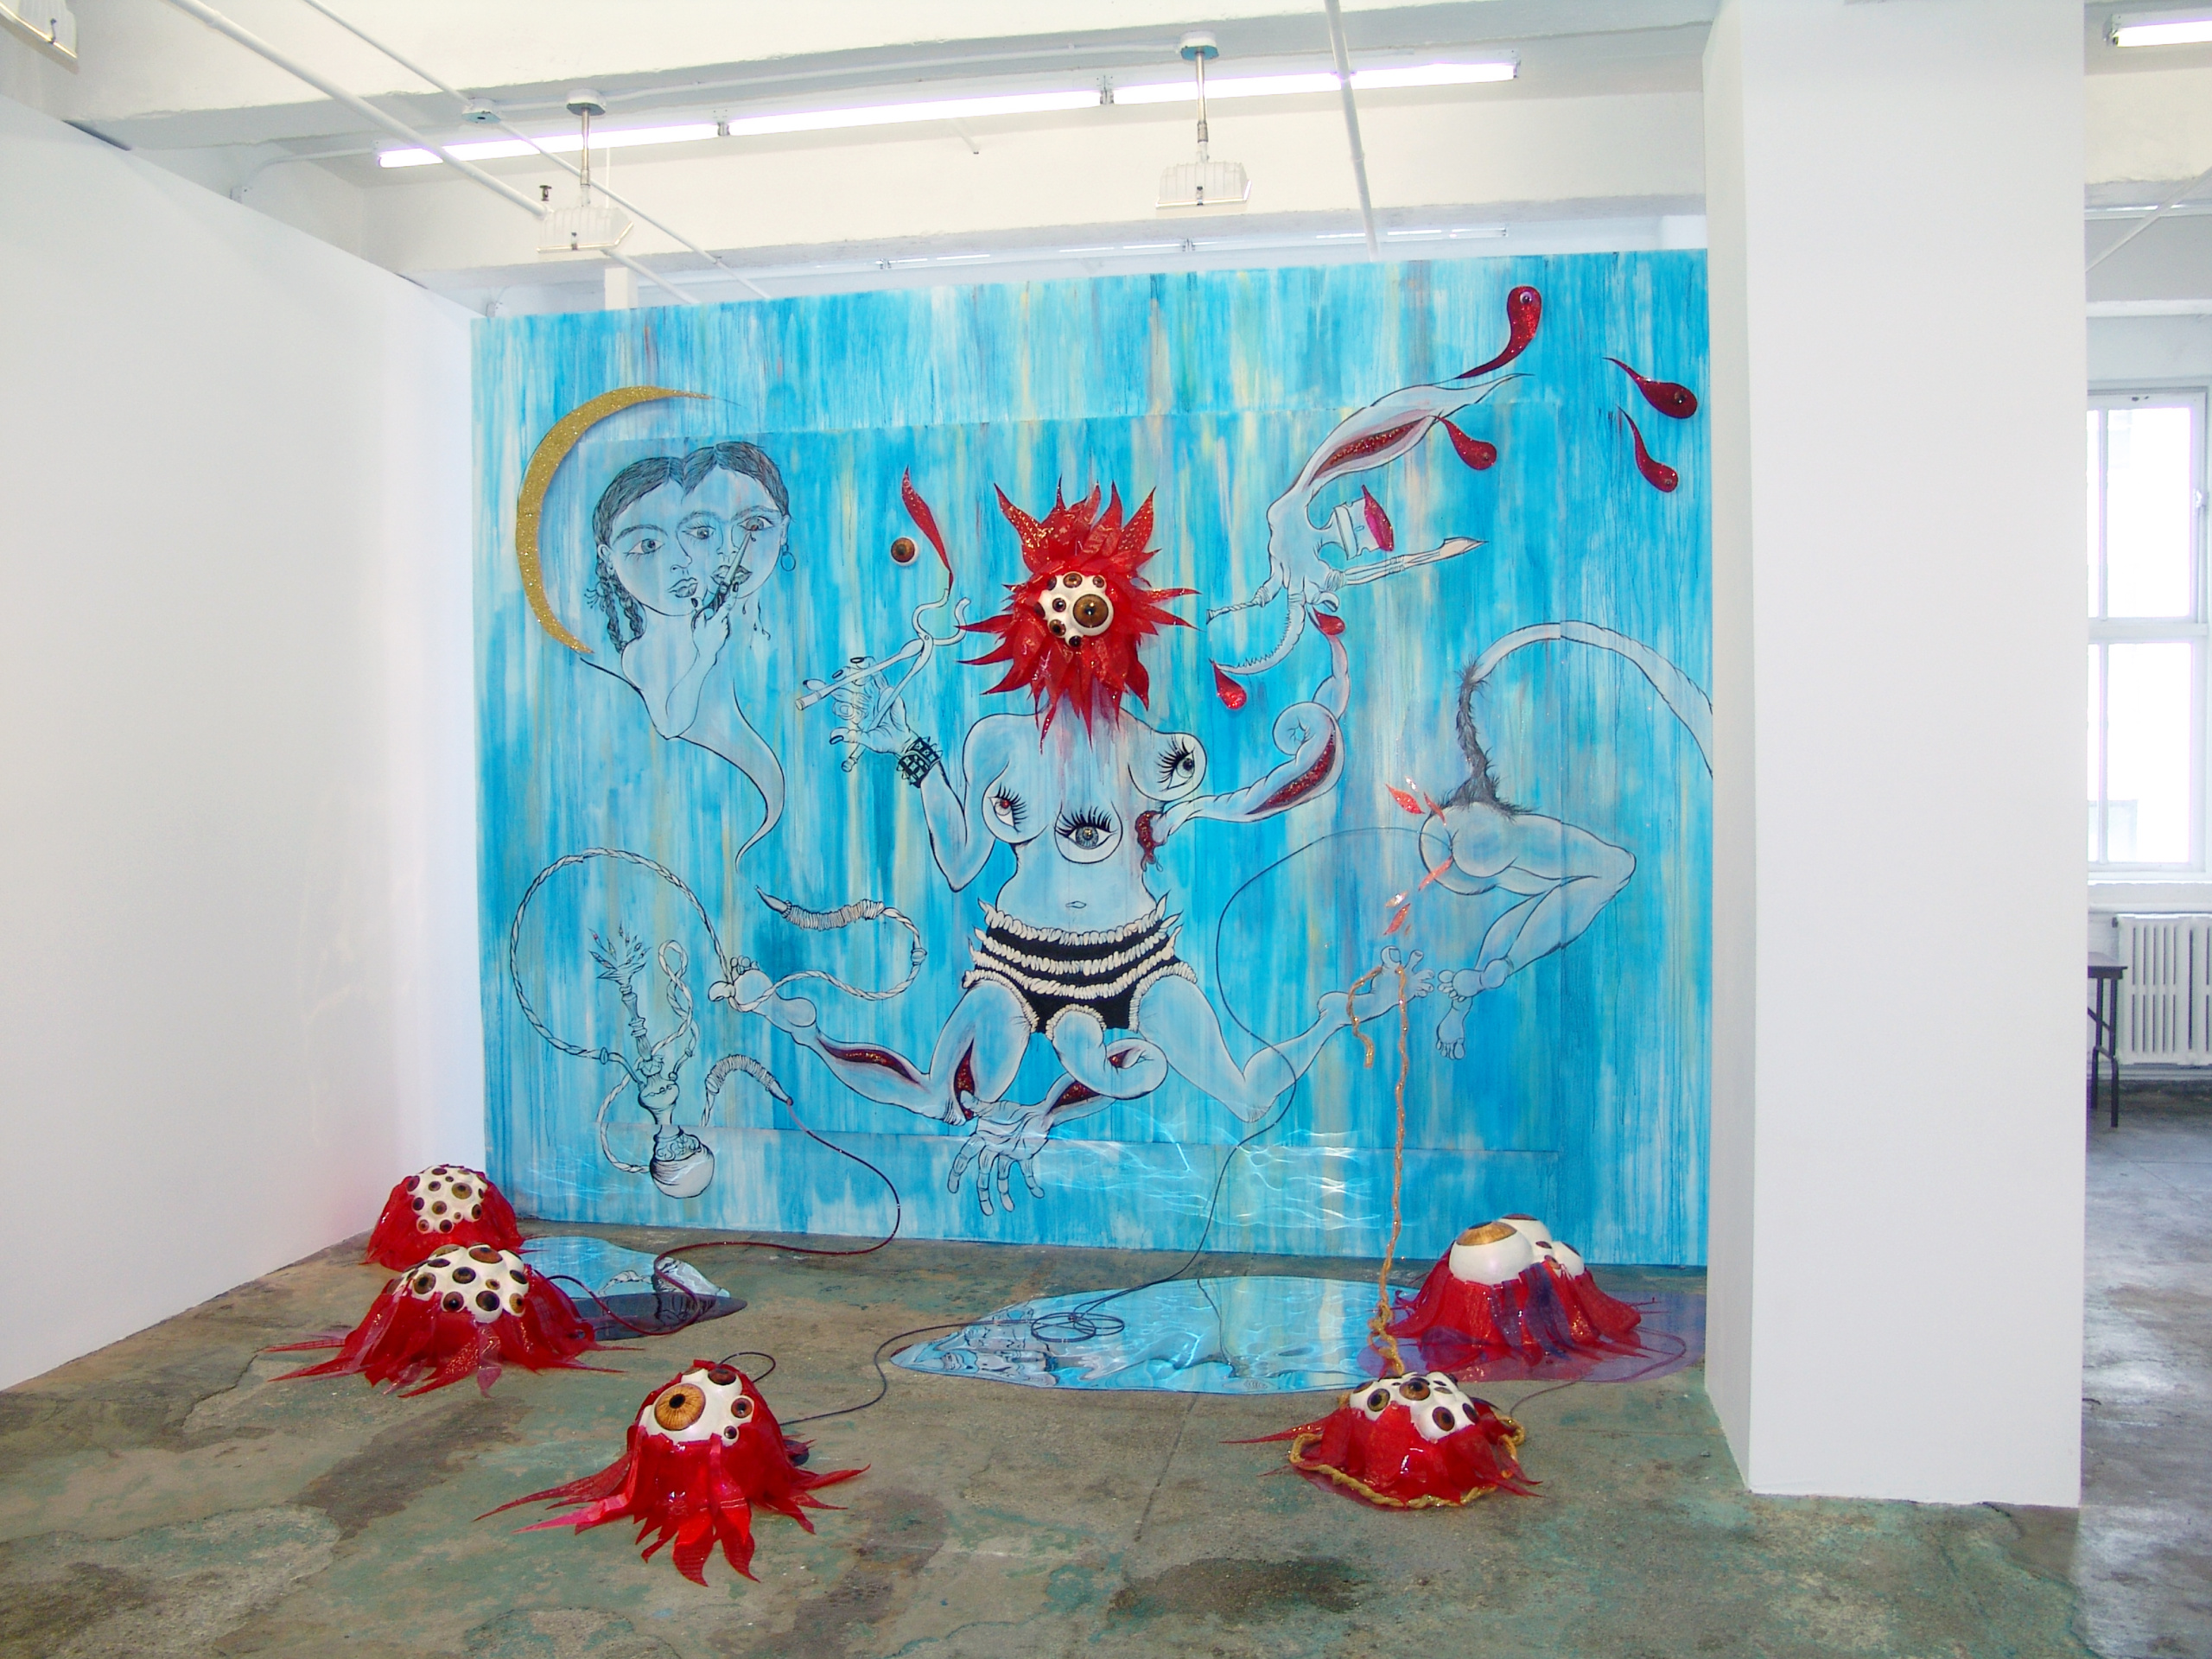 Chitra Ganesh – Upon Her Precipice - Installation view.